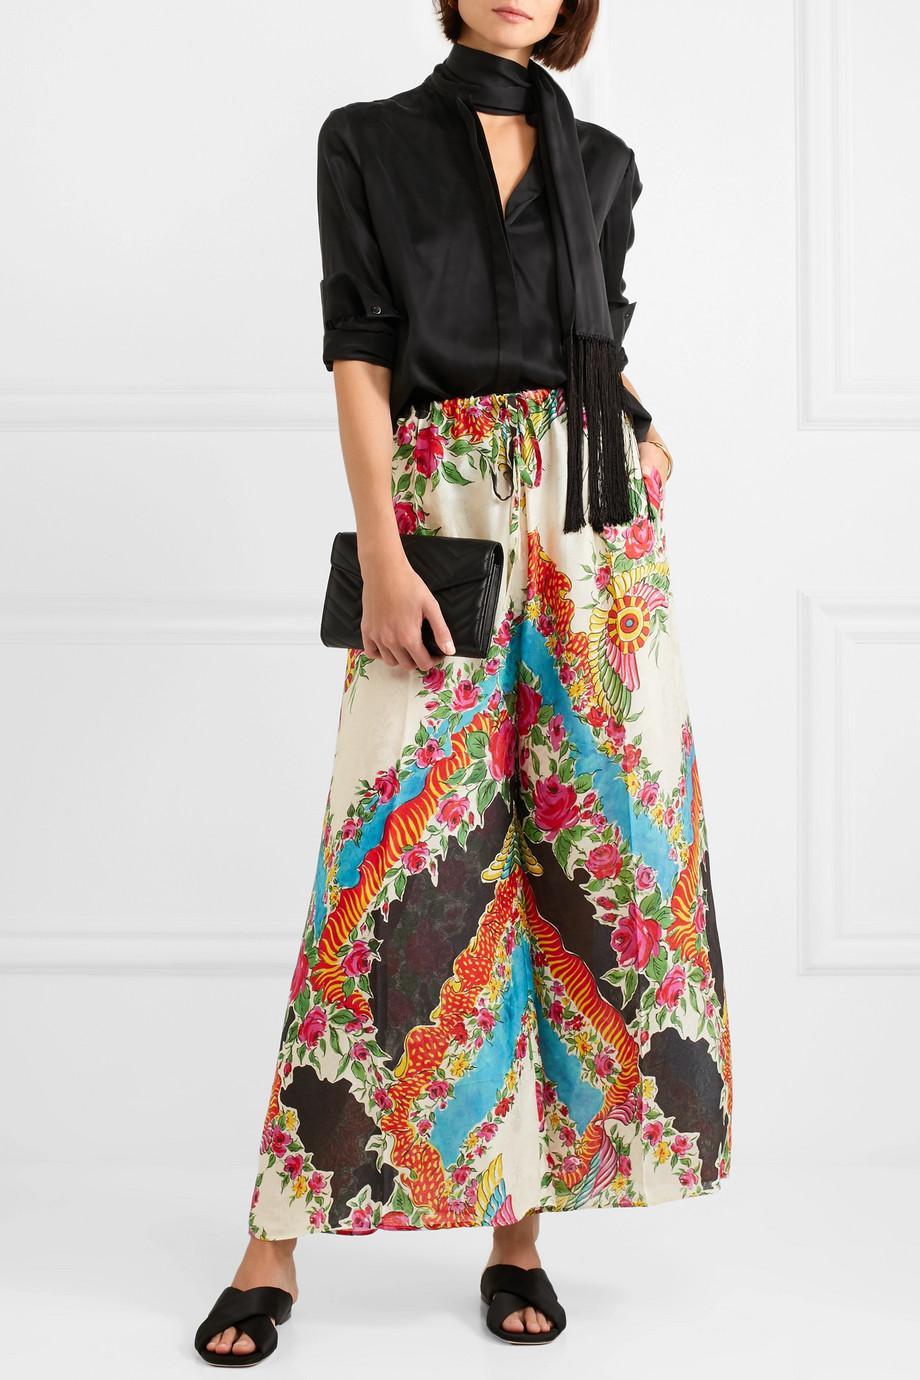 Floral Imprimé Satin Jacquard Pantalon Large Jambe - Gucci Noir cwgPTxX